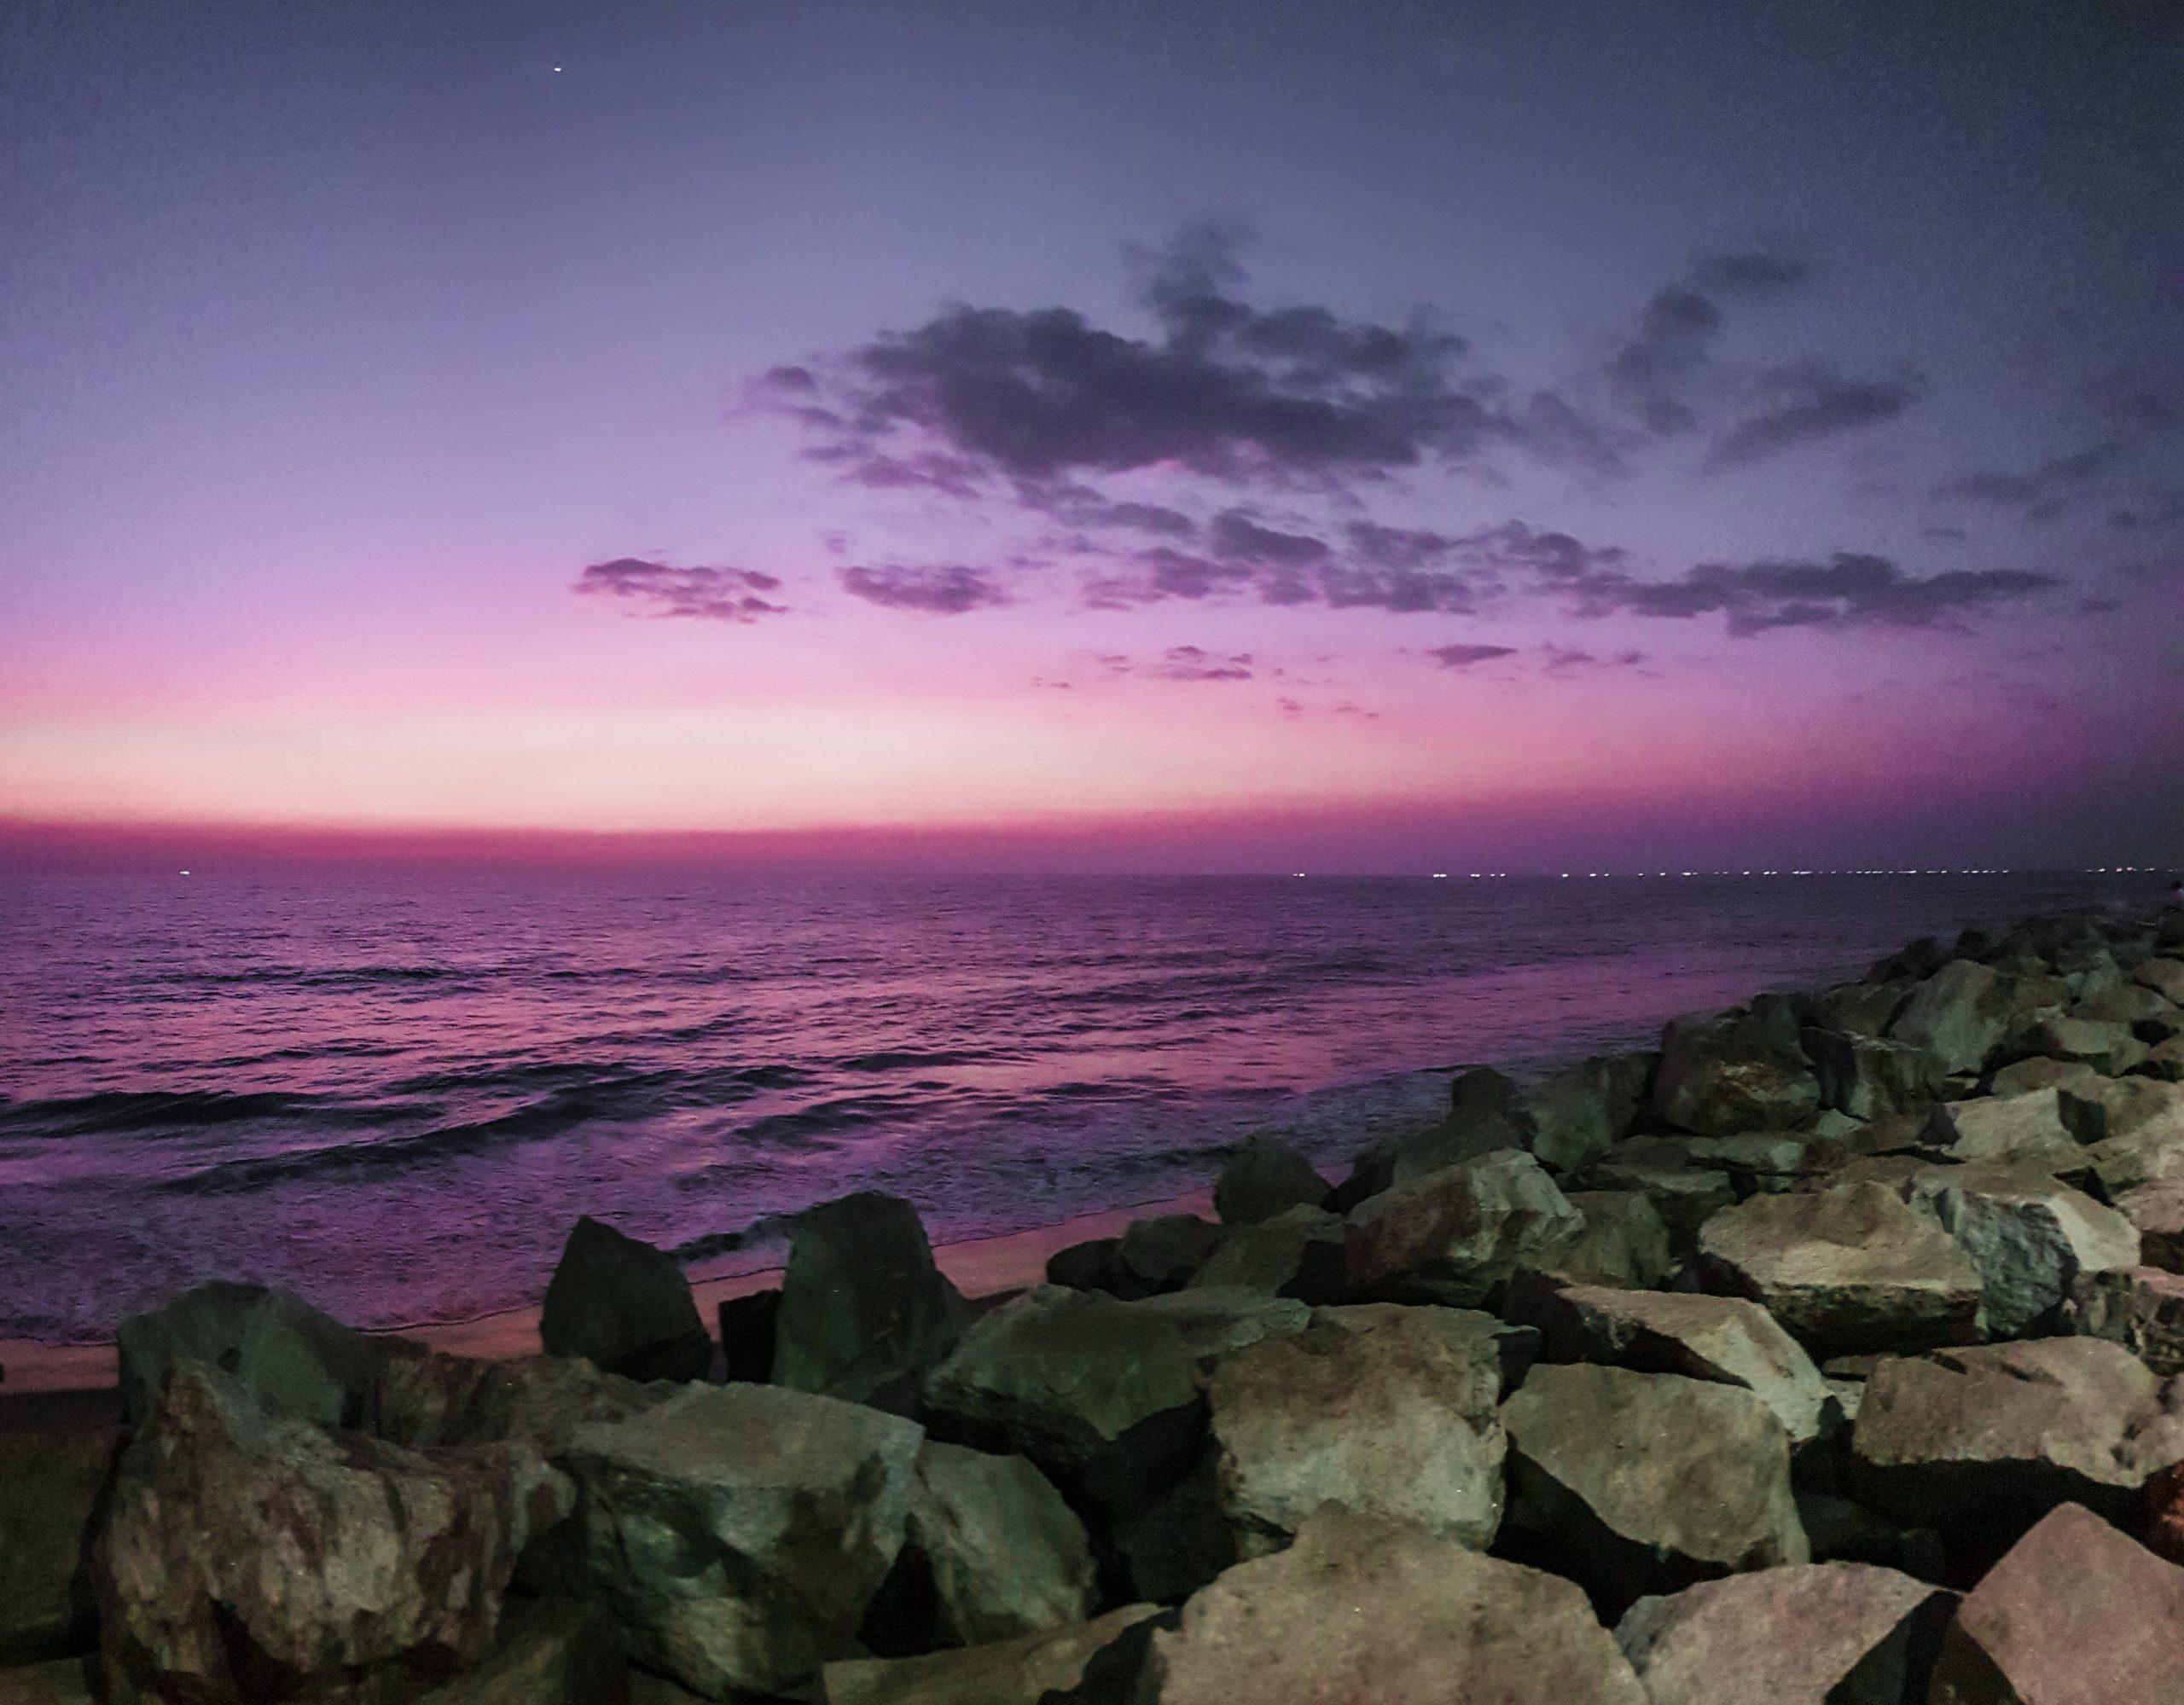 Sunset at rock beach